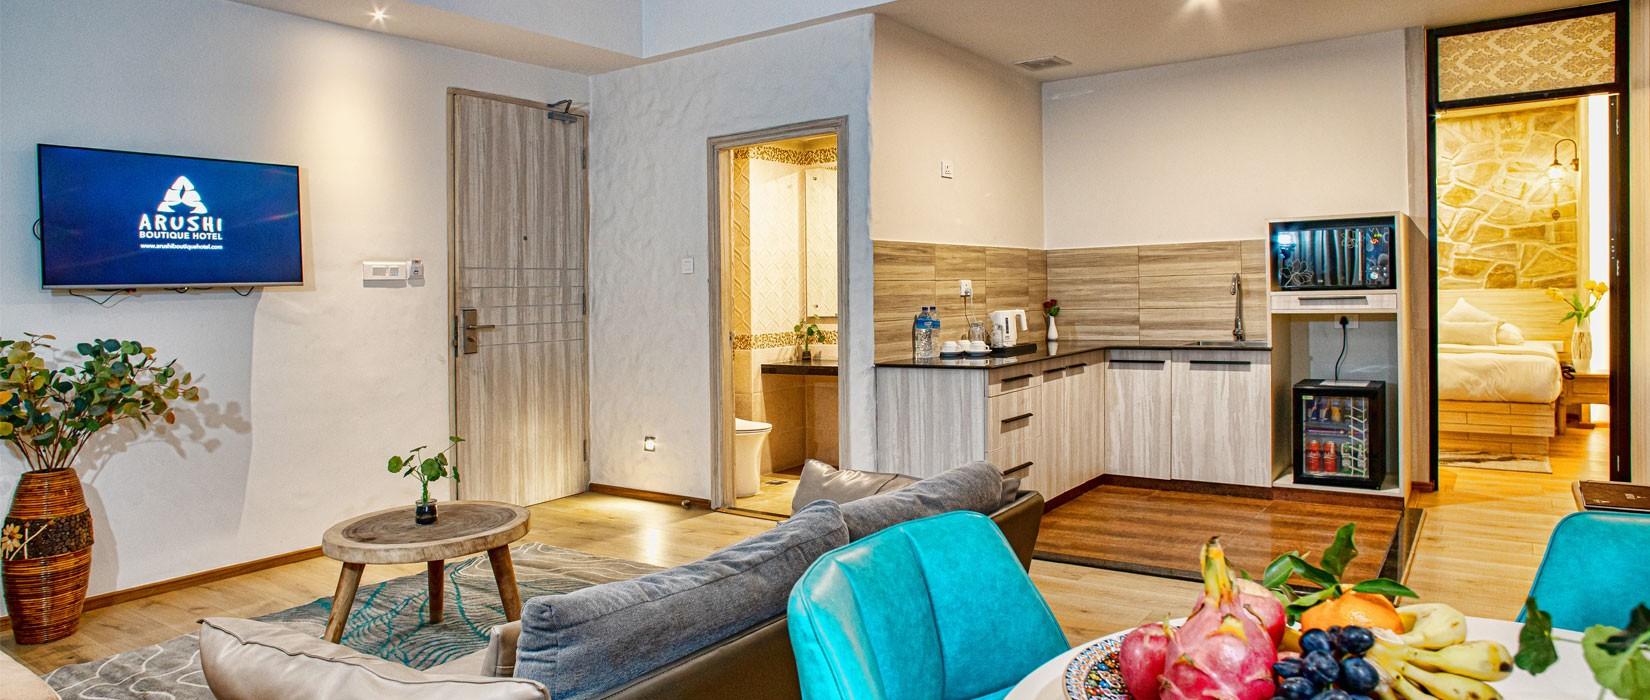 Arushi Boutique Hotel Suite Room